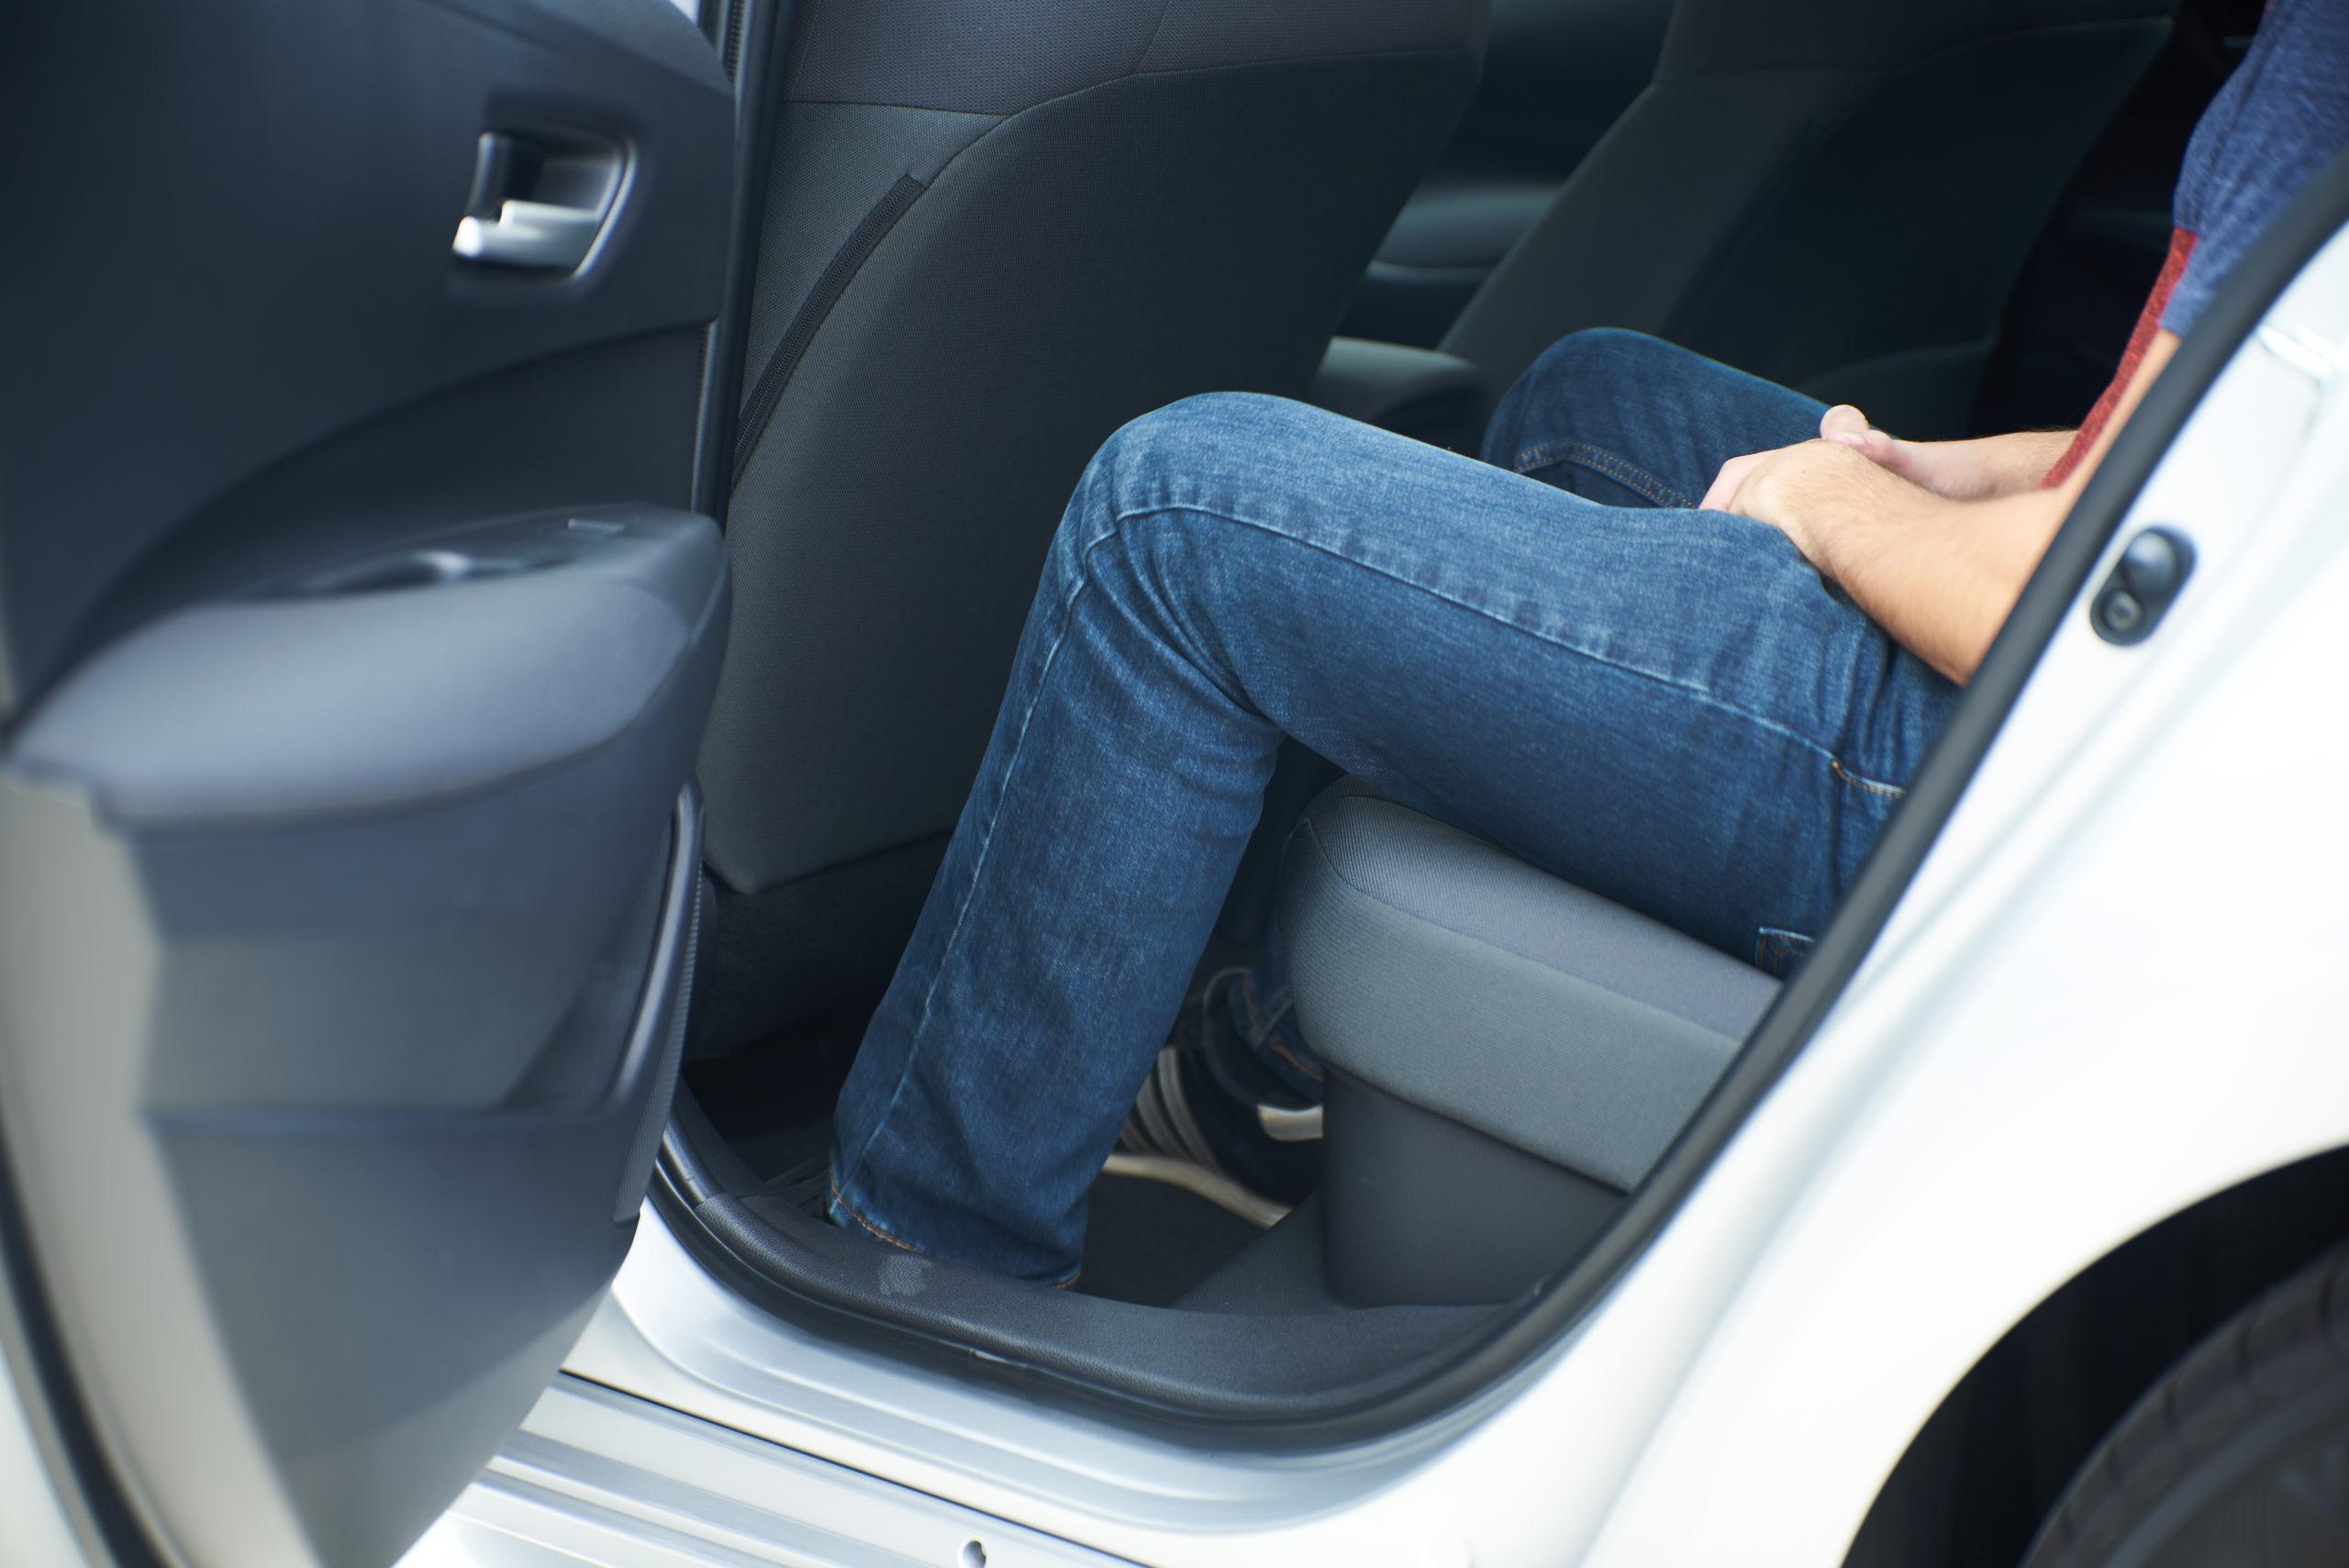 2021 Toyota Corolla Hybrid legroom